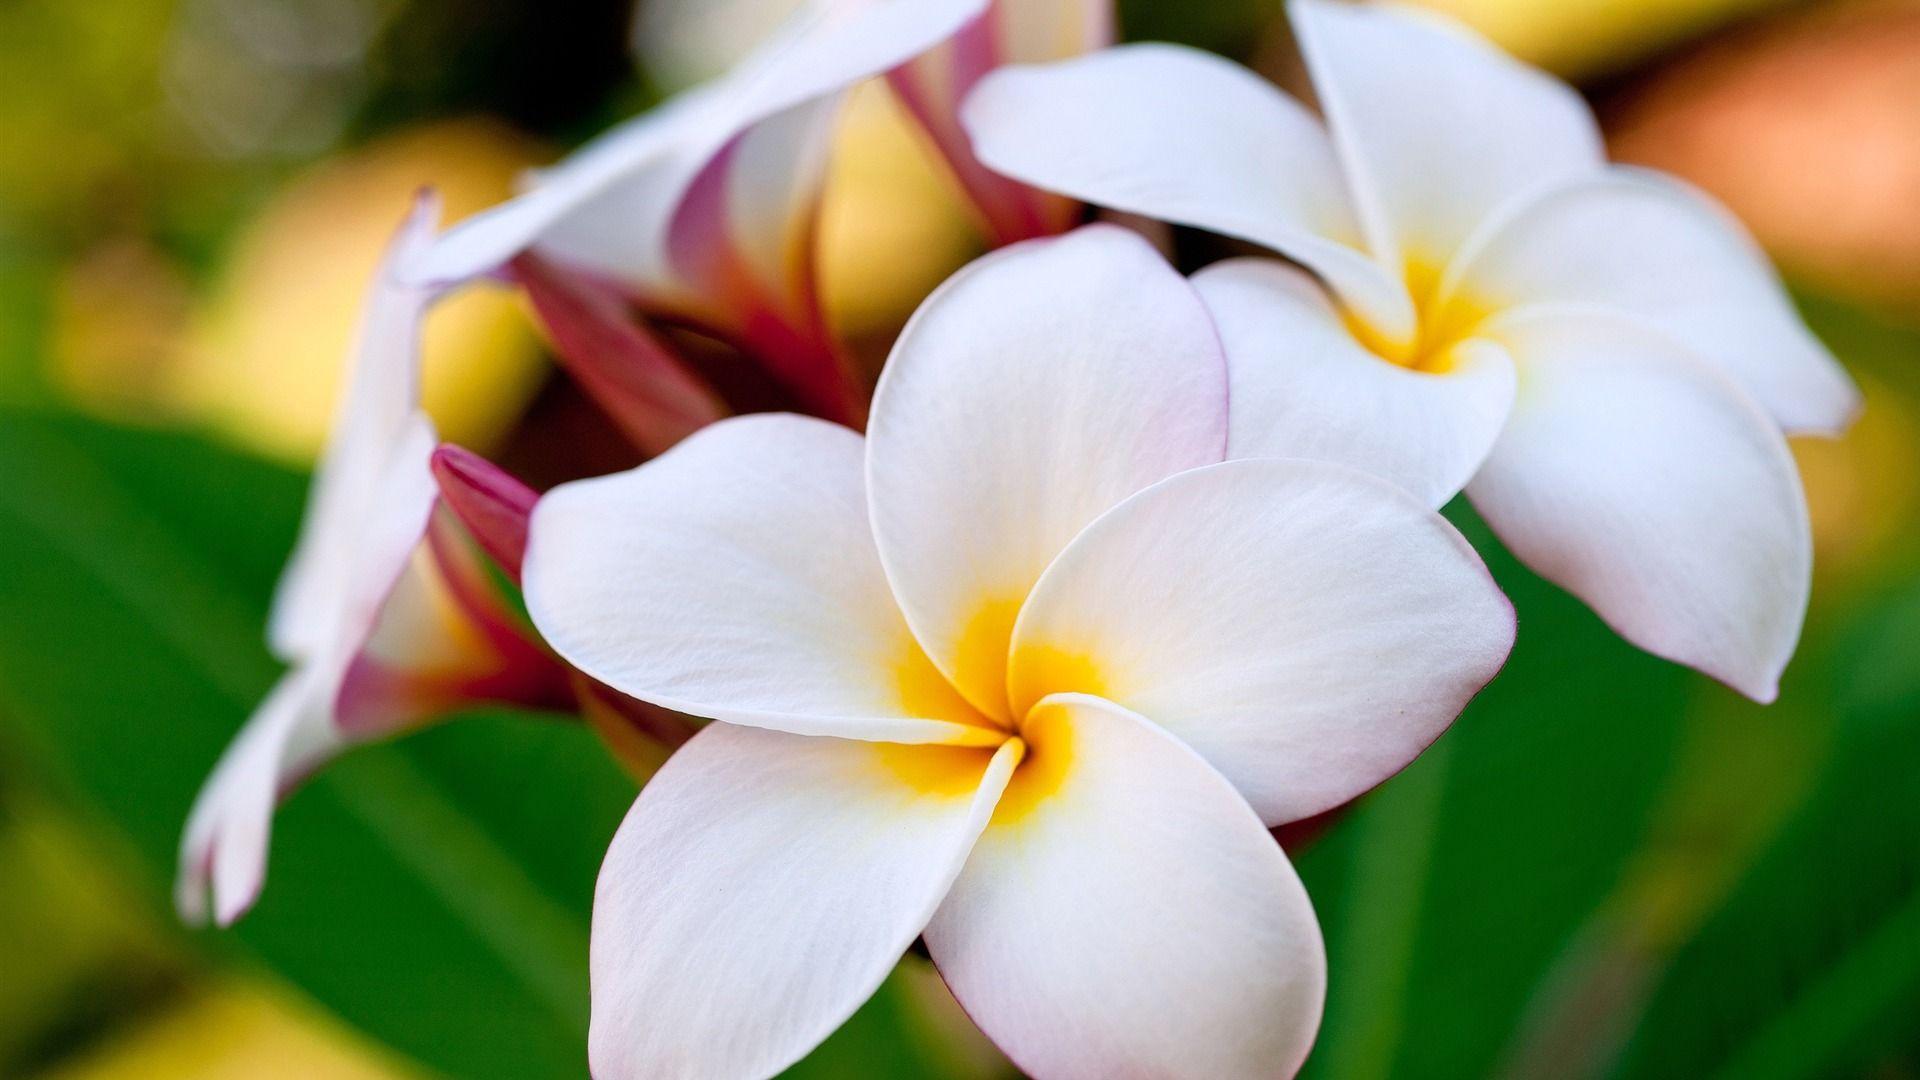 Pin by sjuarez on my ideal garden pinterest hawaiian flowers shite flowers always make me smile mightylinksfo